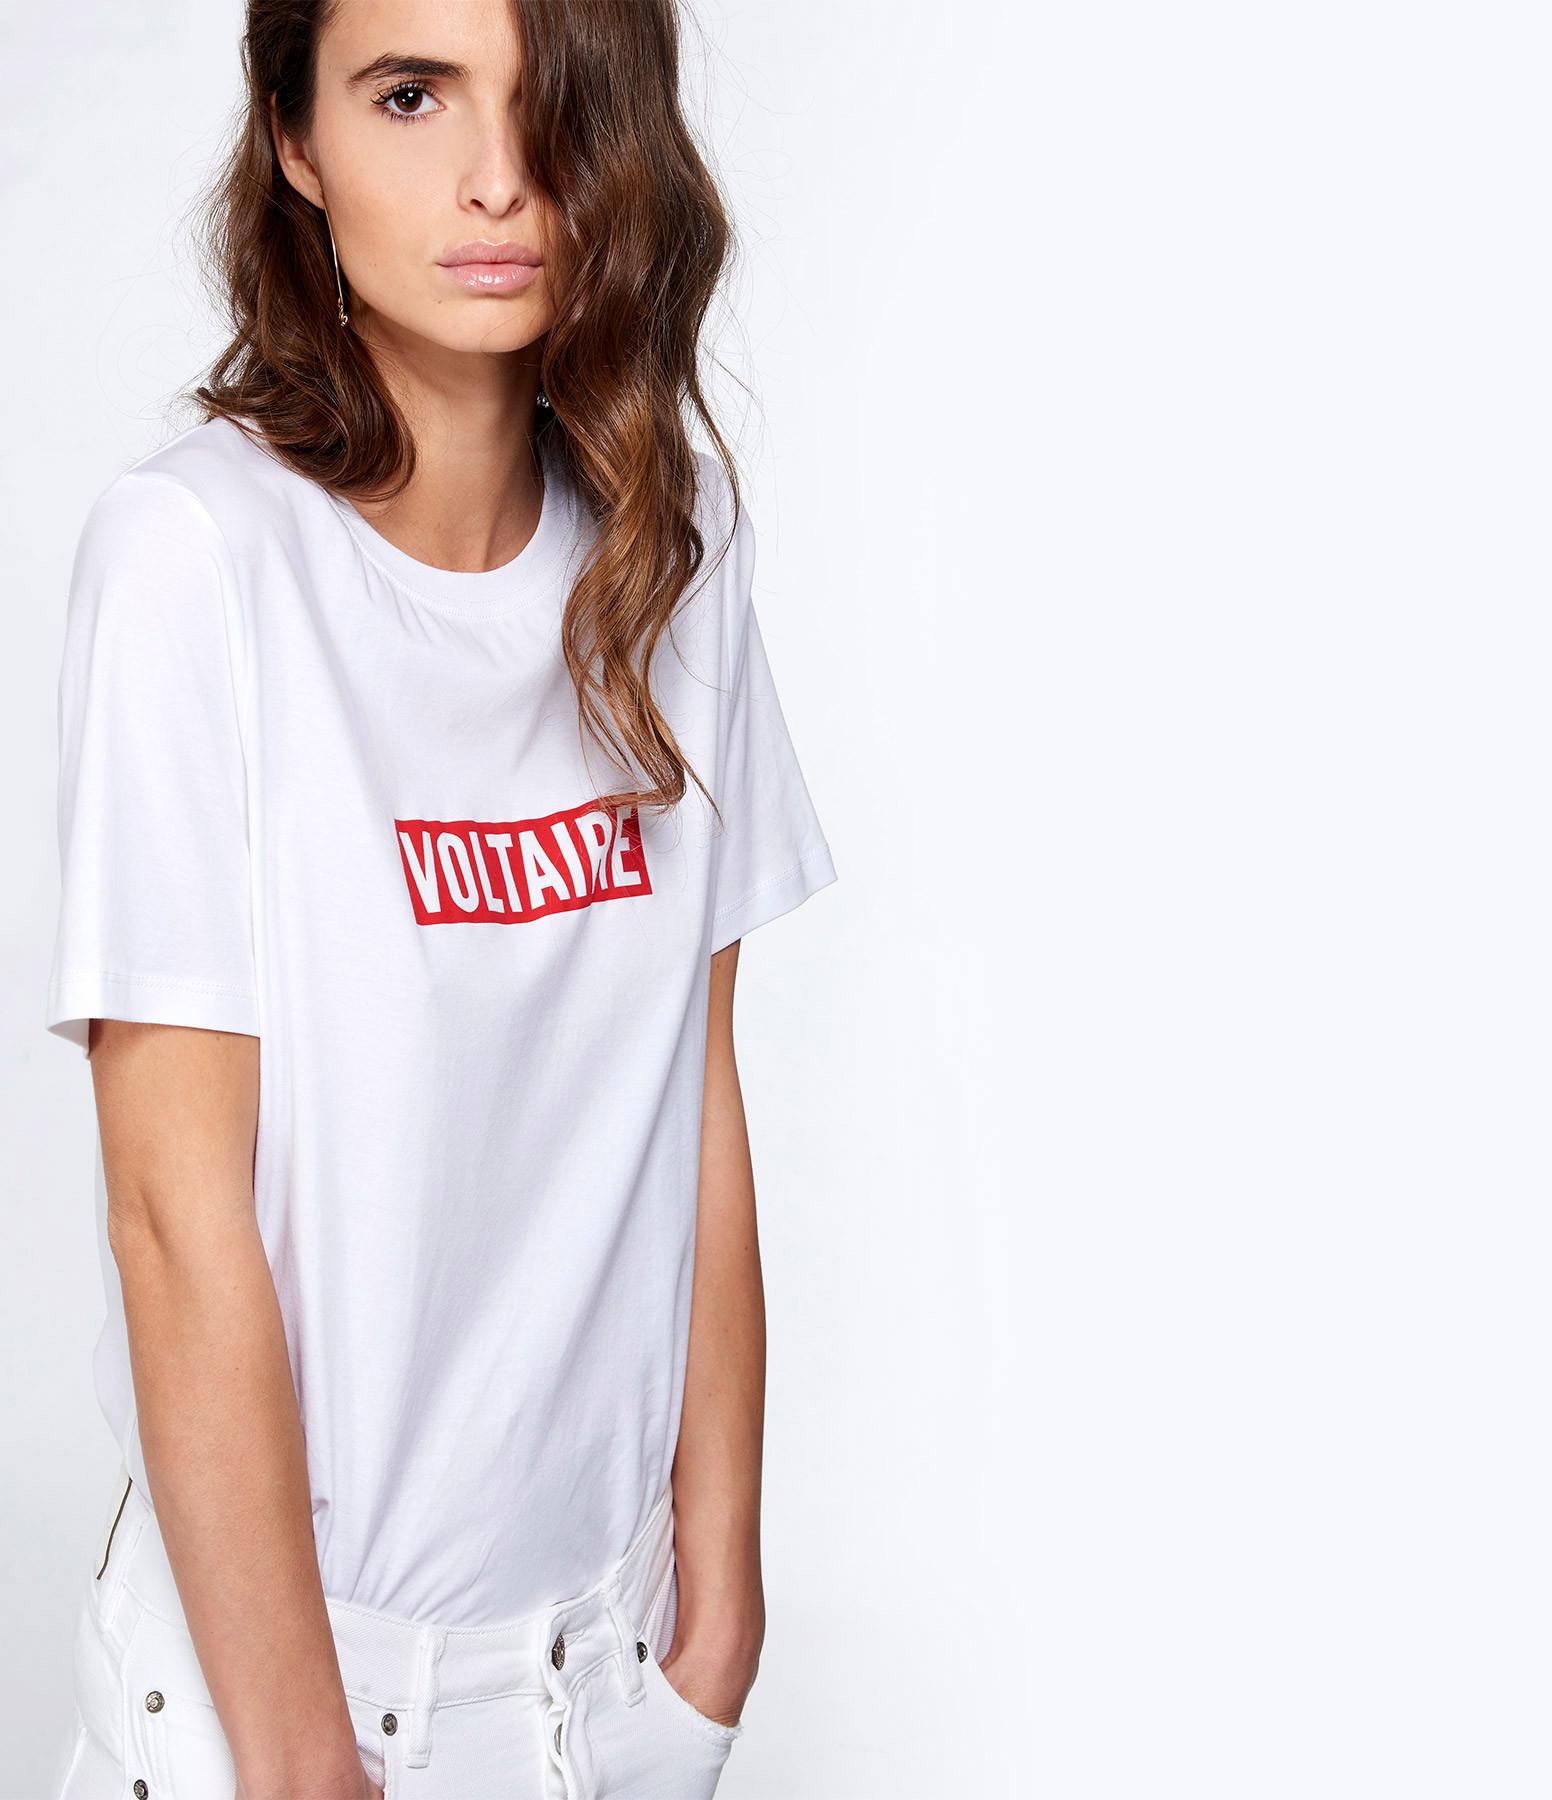 ZADIG & VOLTAIRE - Tee-shirt Bella Voltaire Coton Blanc